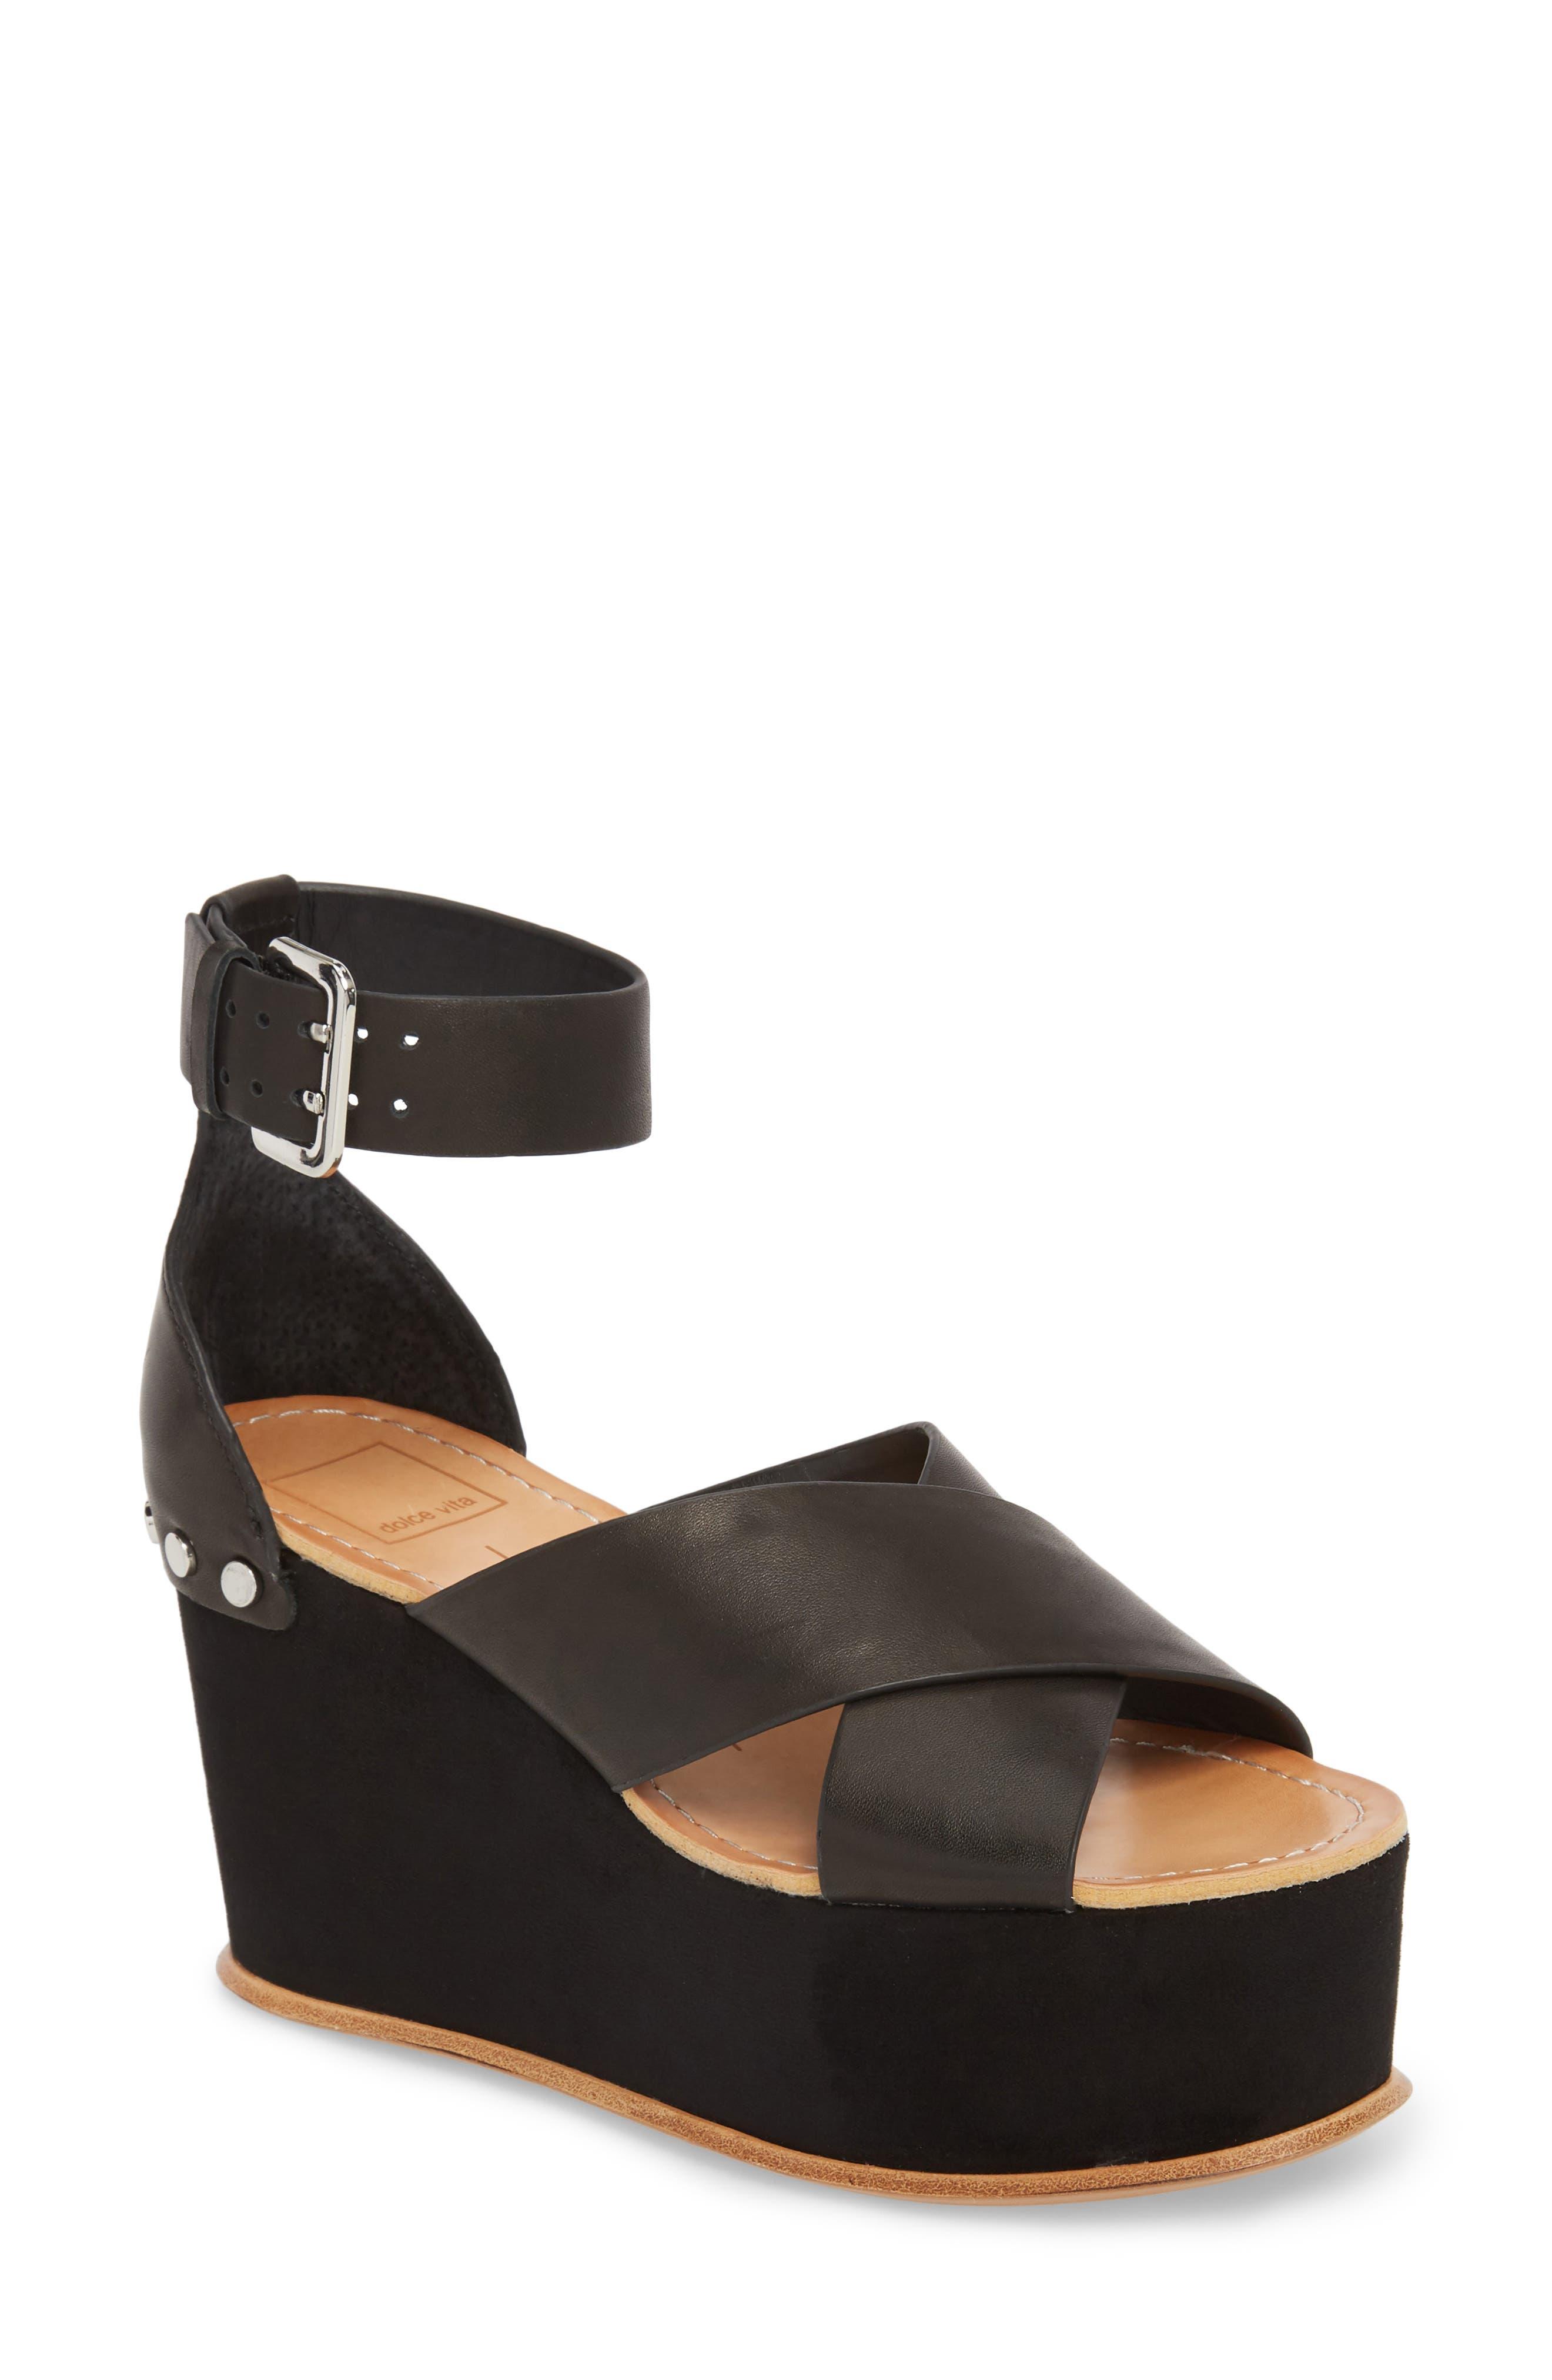 DOLCE VITA,                             Dalrae Platform Wedge Sandal,                             Main thumbnail 1, color,                             001